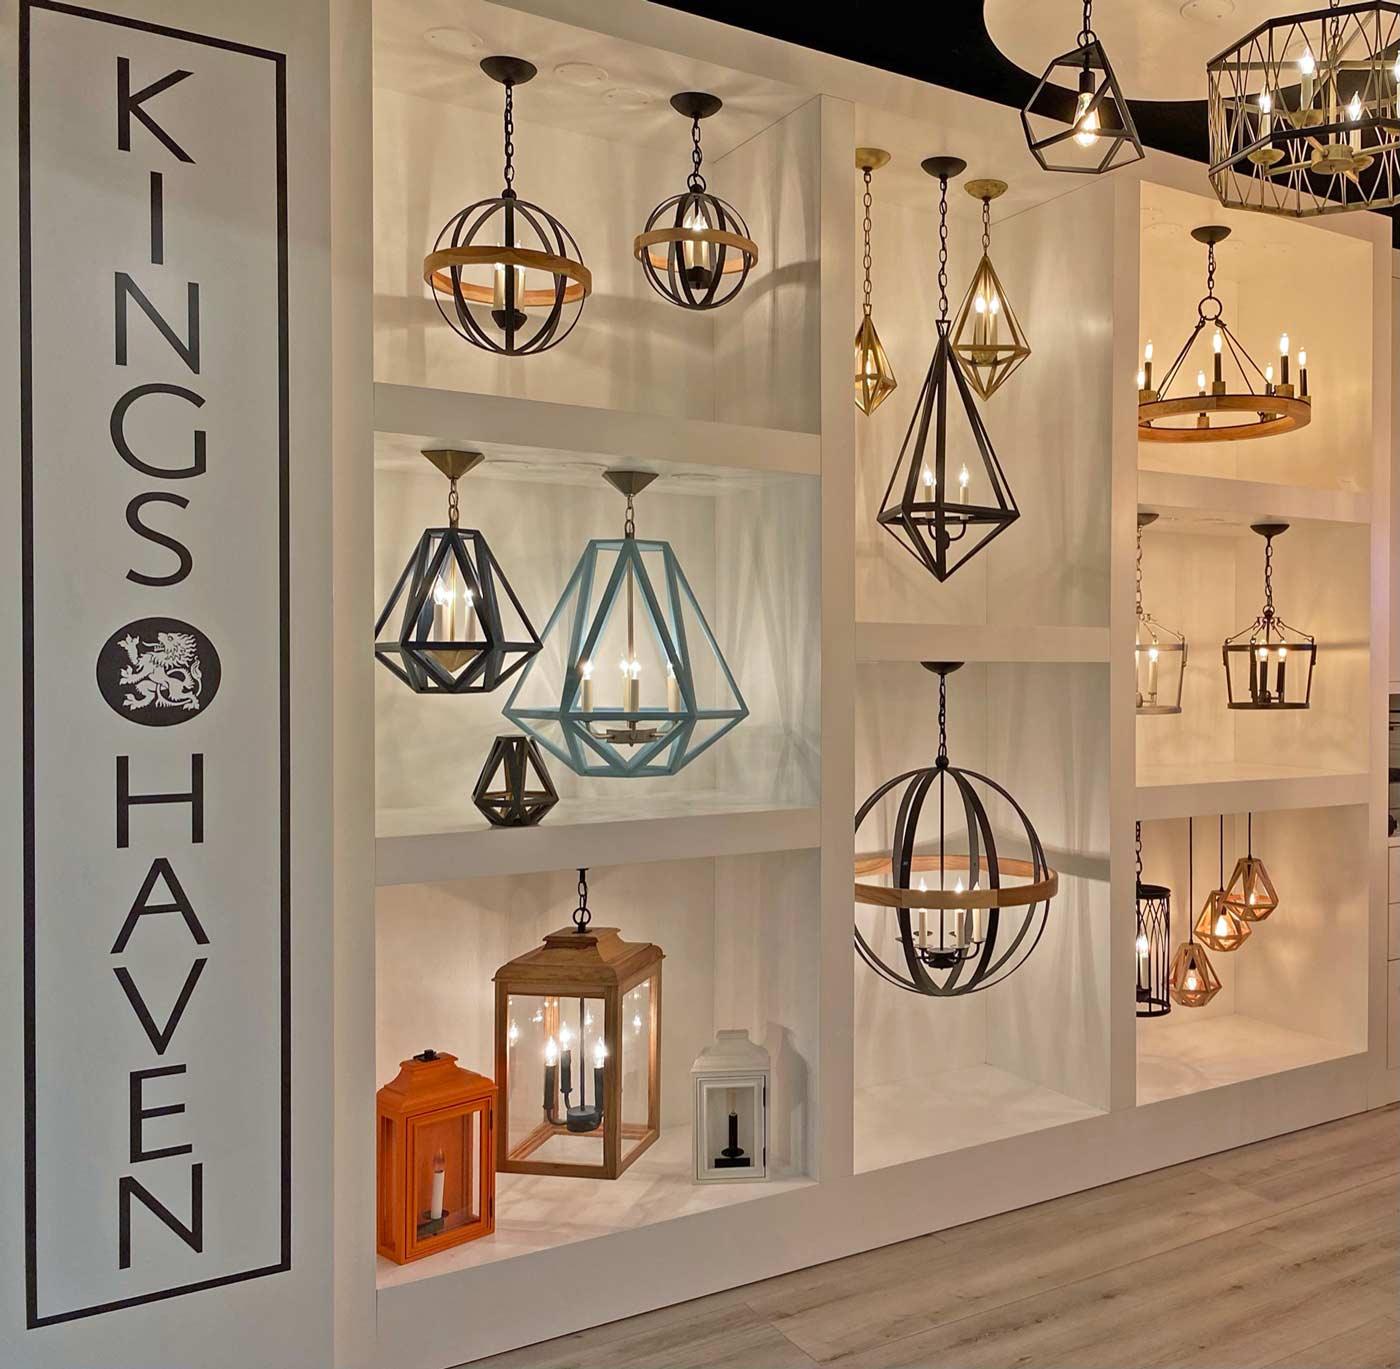 KingsHaven - Fall Market 2021